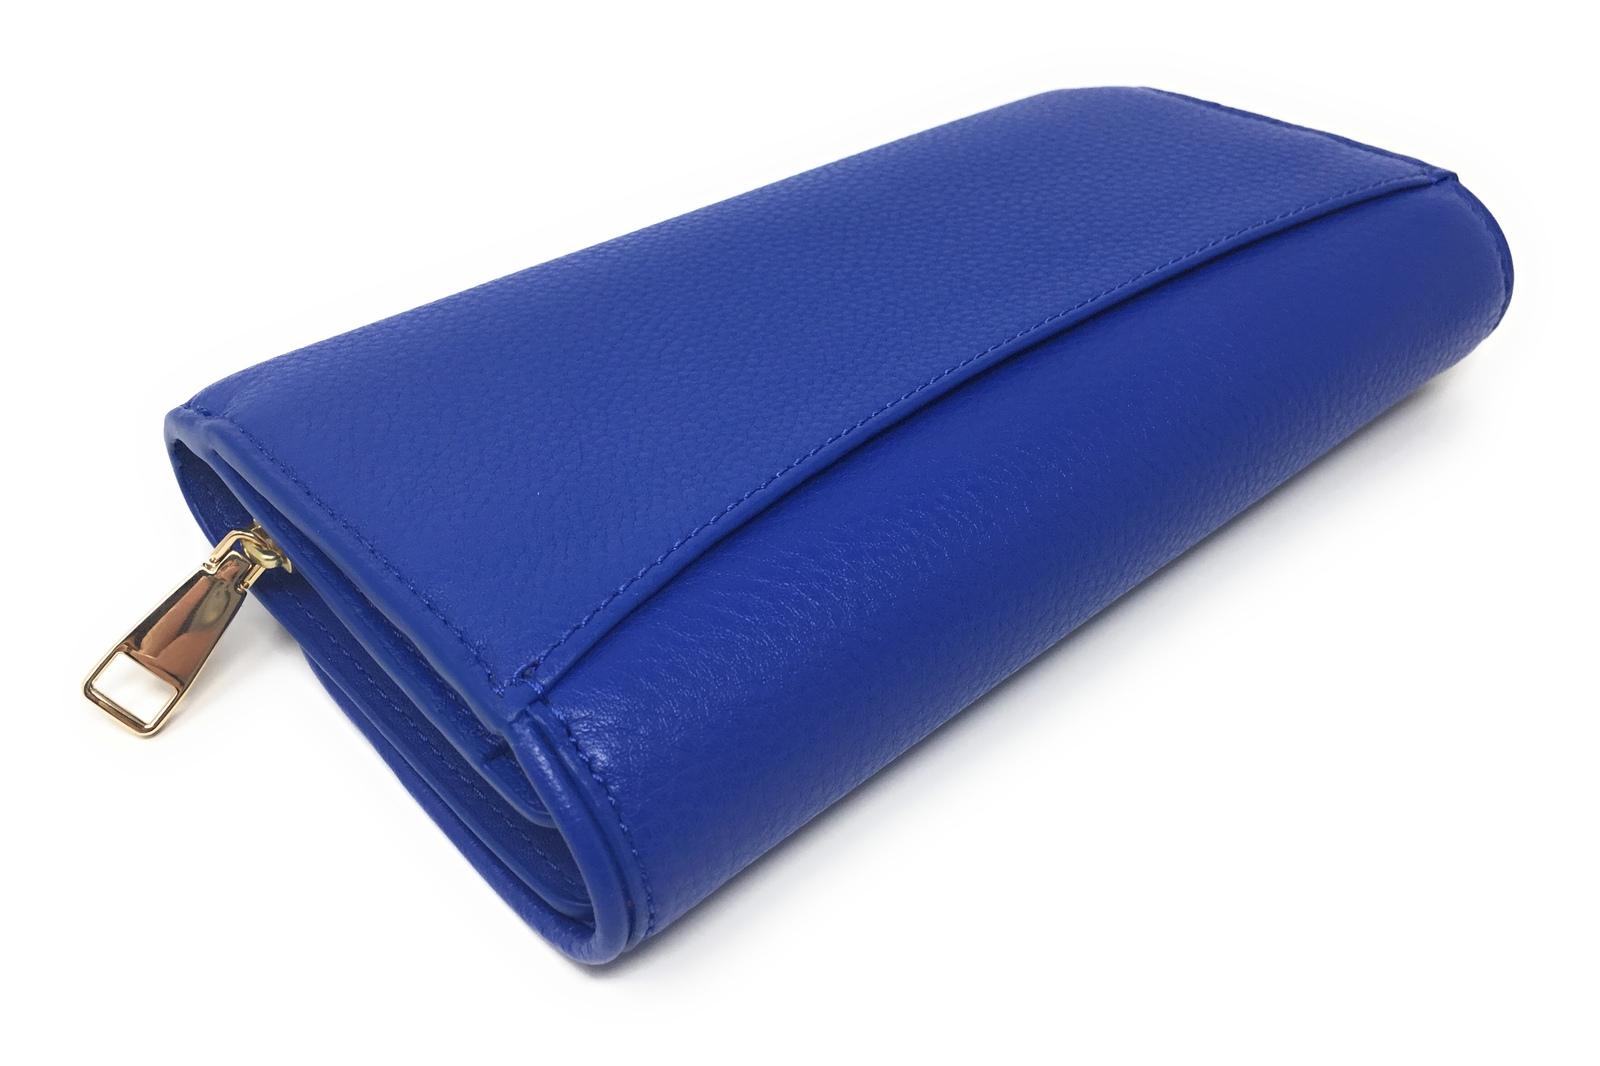 6deecda325 Tory Burch Britten Duo Envelope Continental Wallet Bondi Blue Leather $225  MSRP!